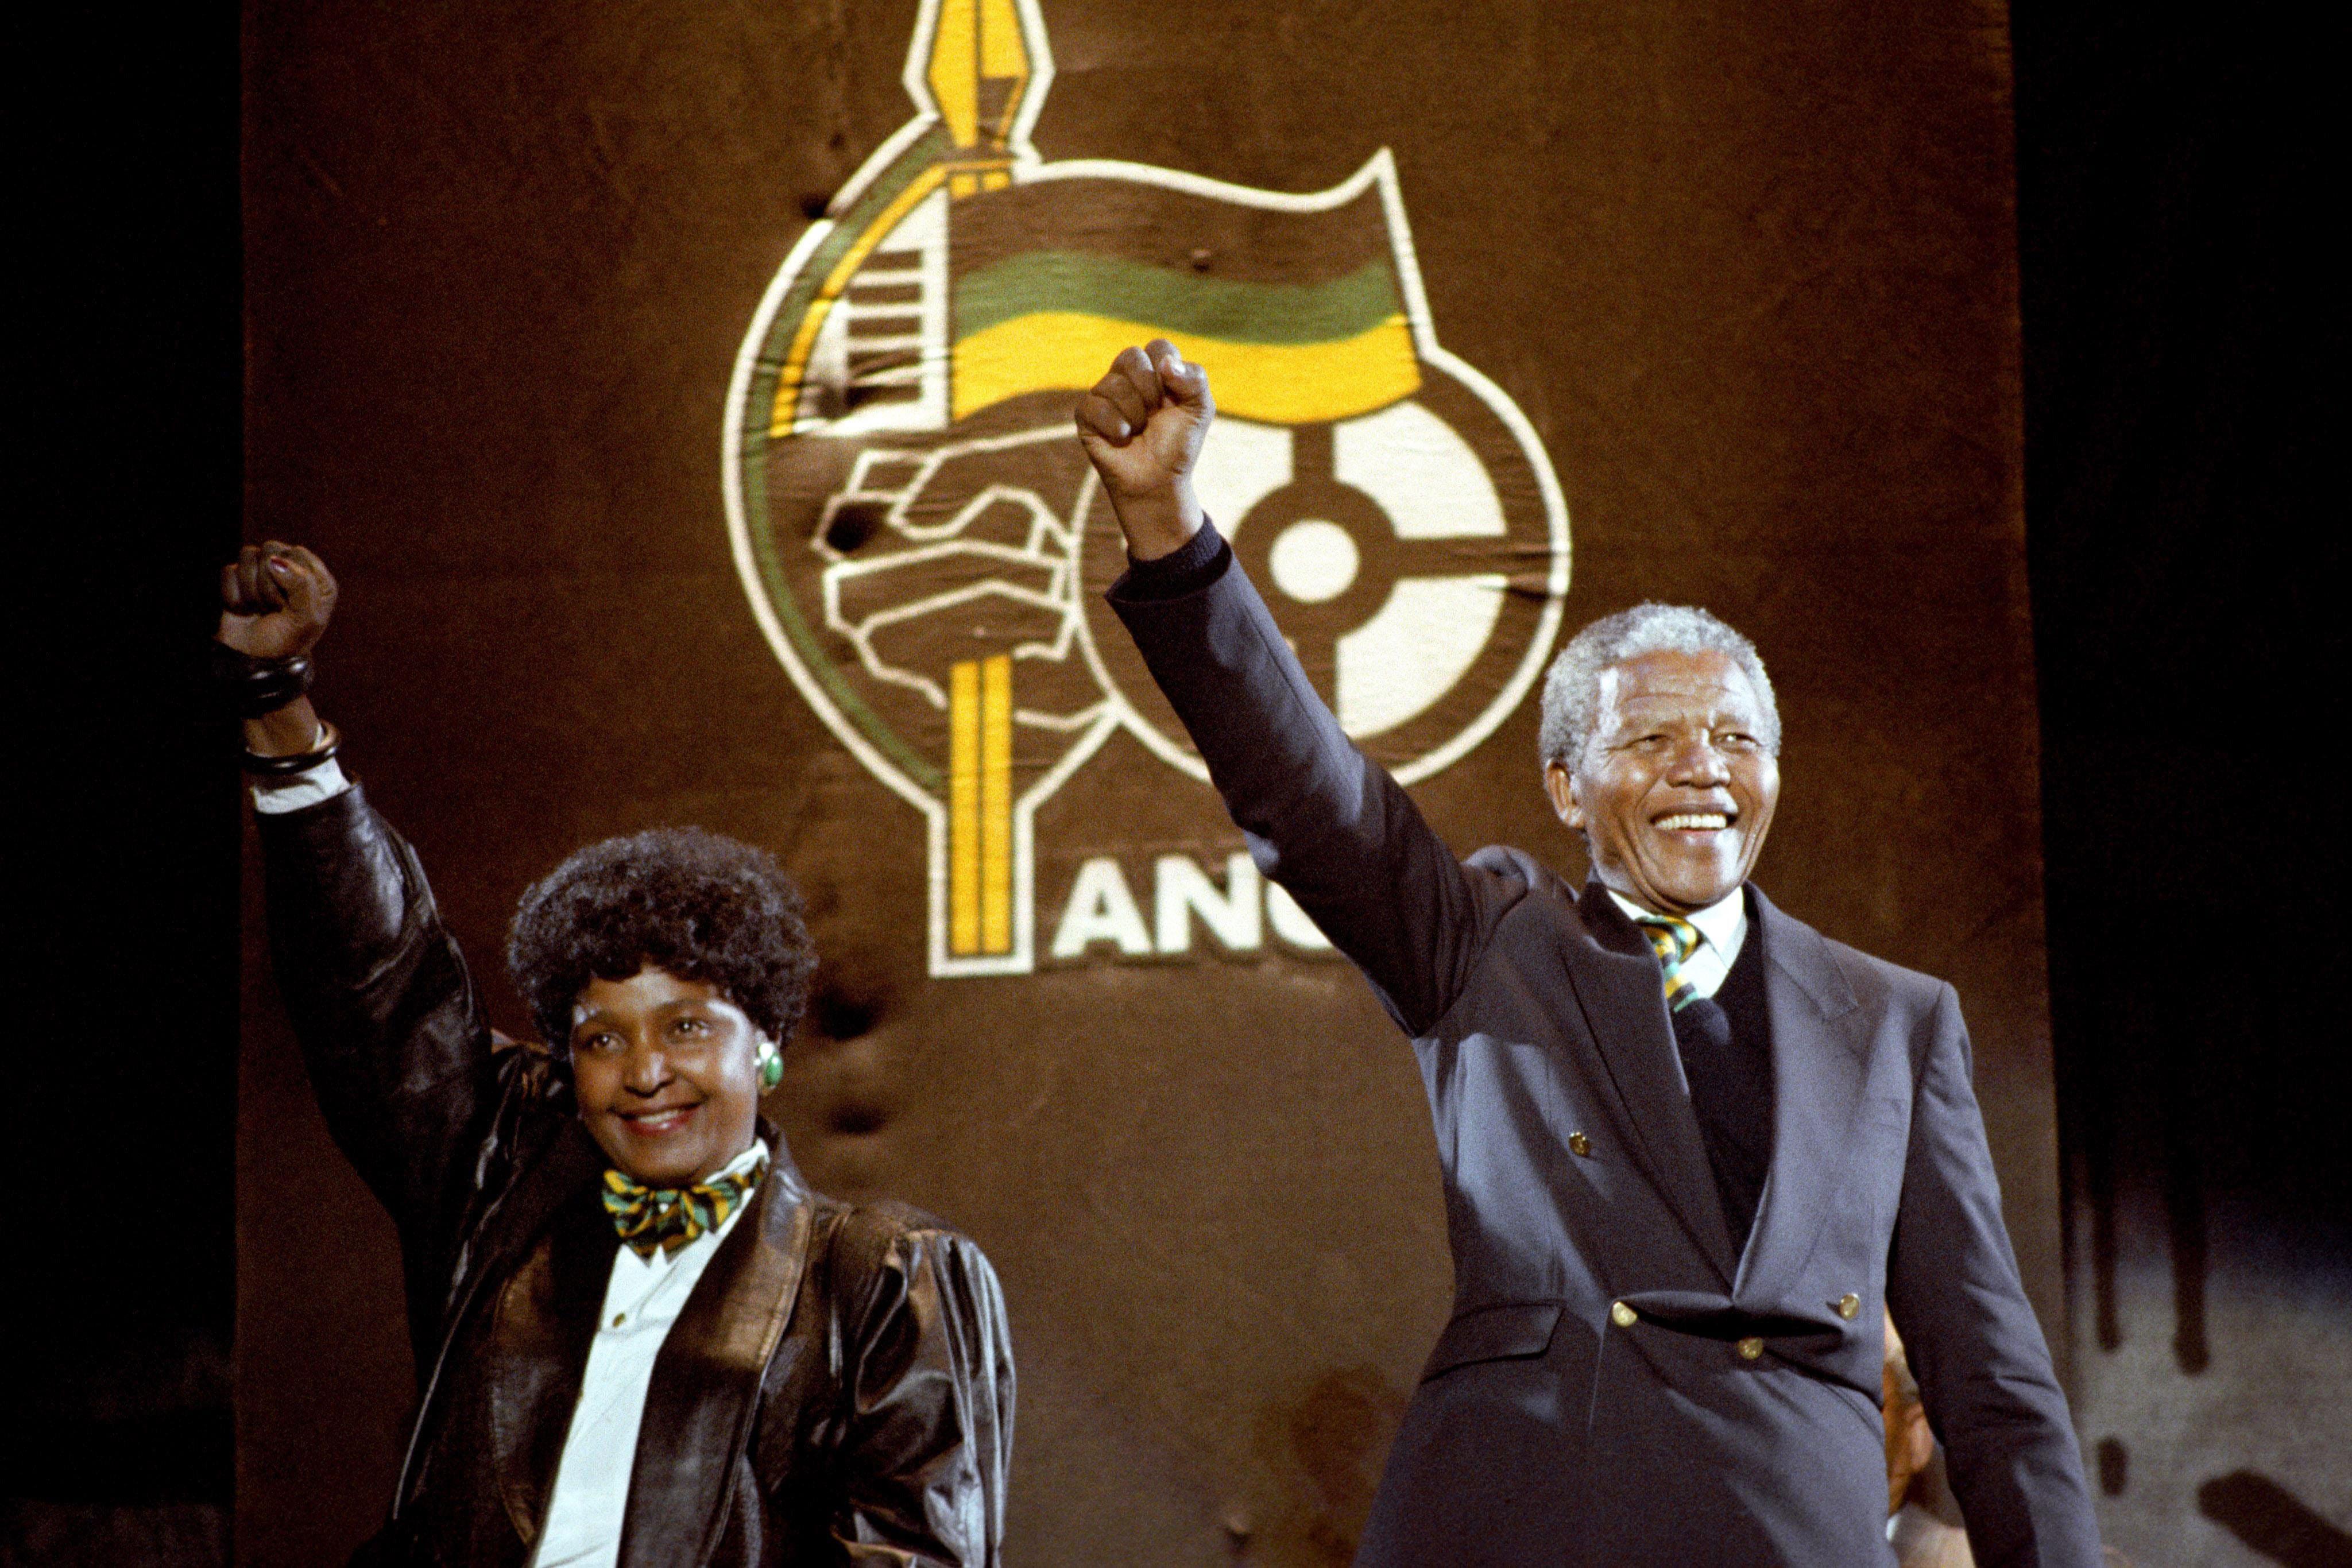 U of T students plan candlelight vigil in Mandela's honour ...